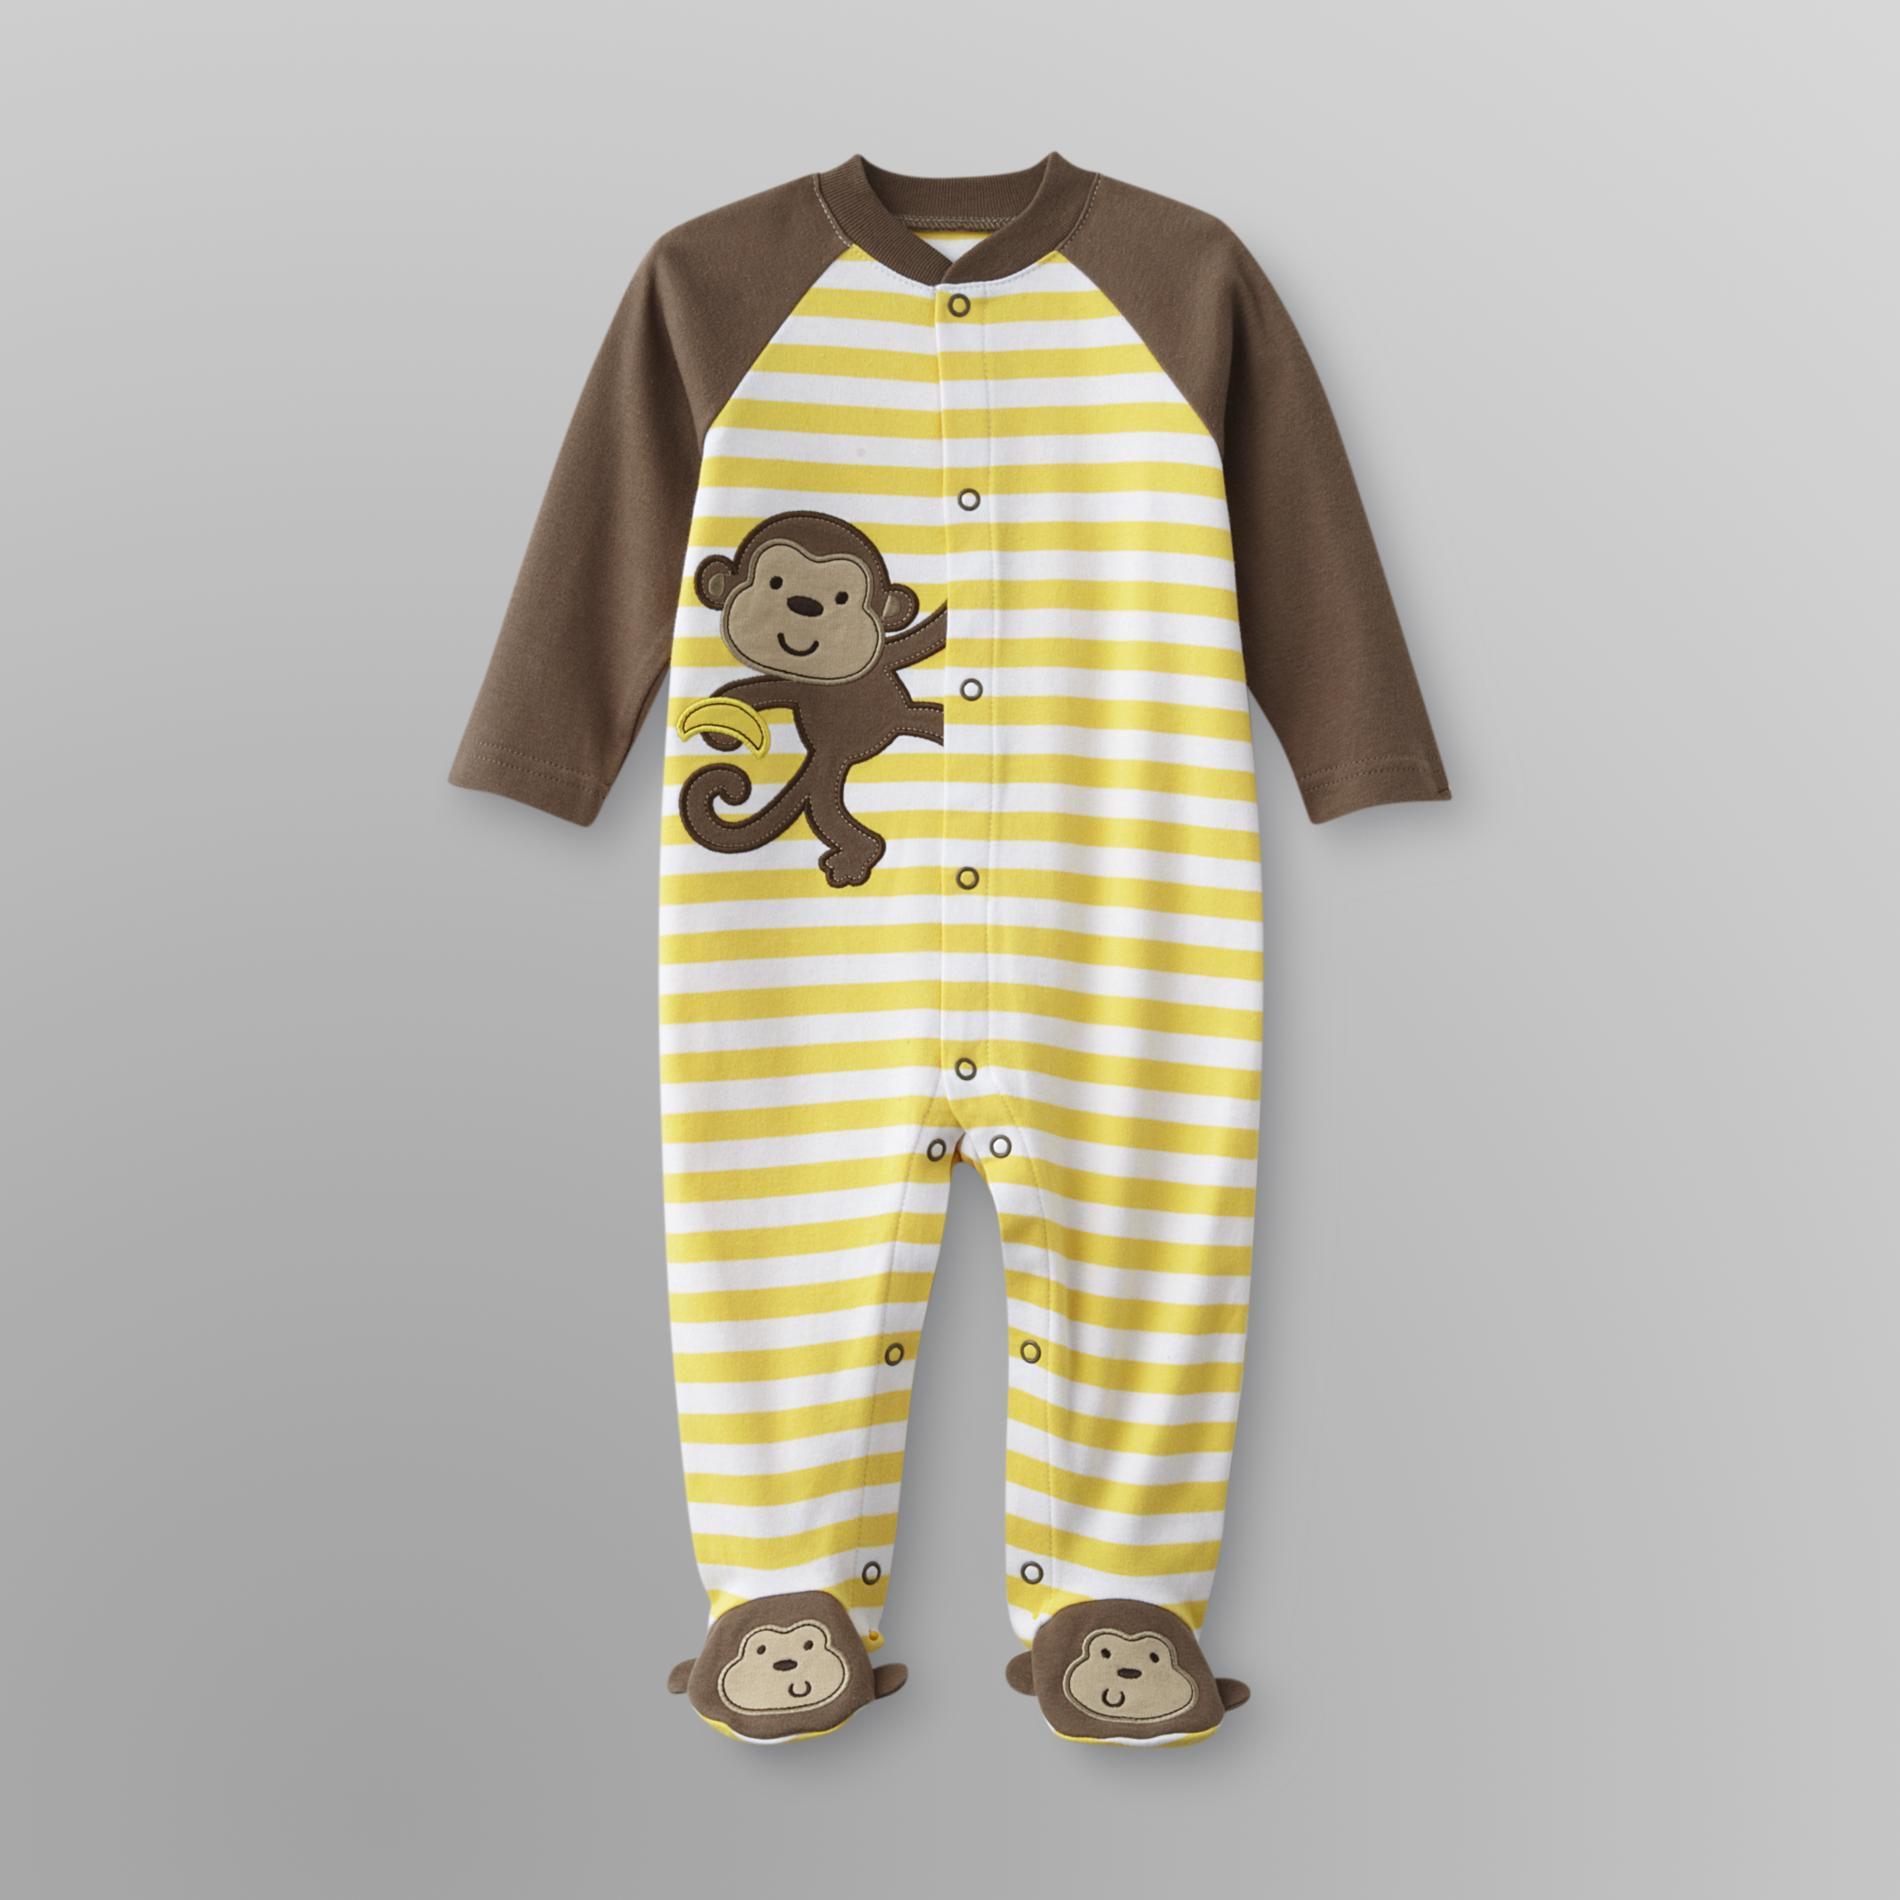 Little Wonders Newborn & Infant Boy's Sleeper Pajamas